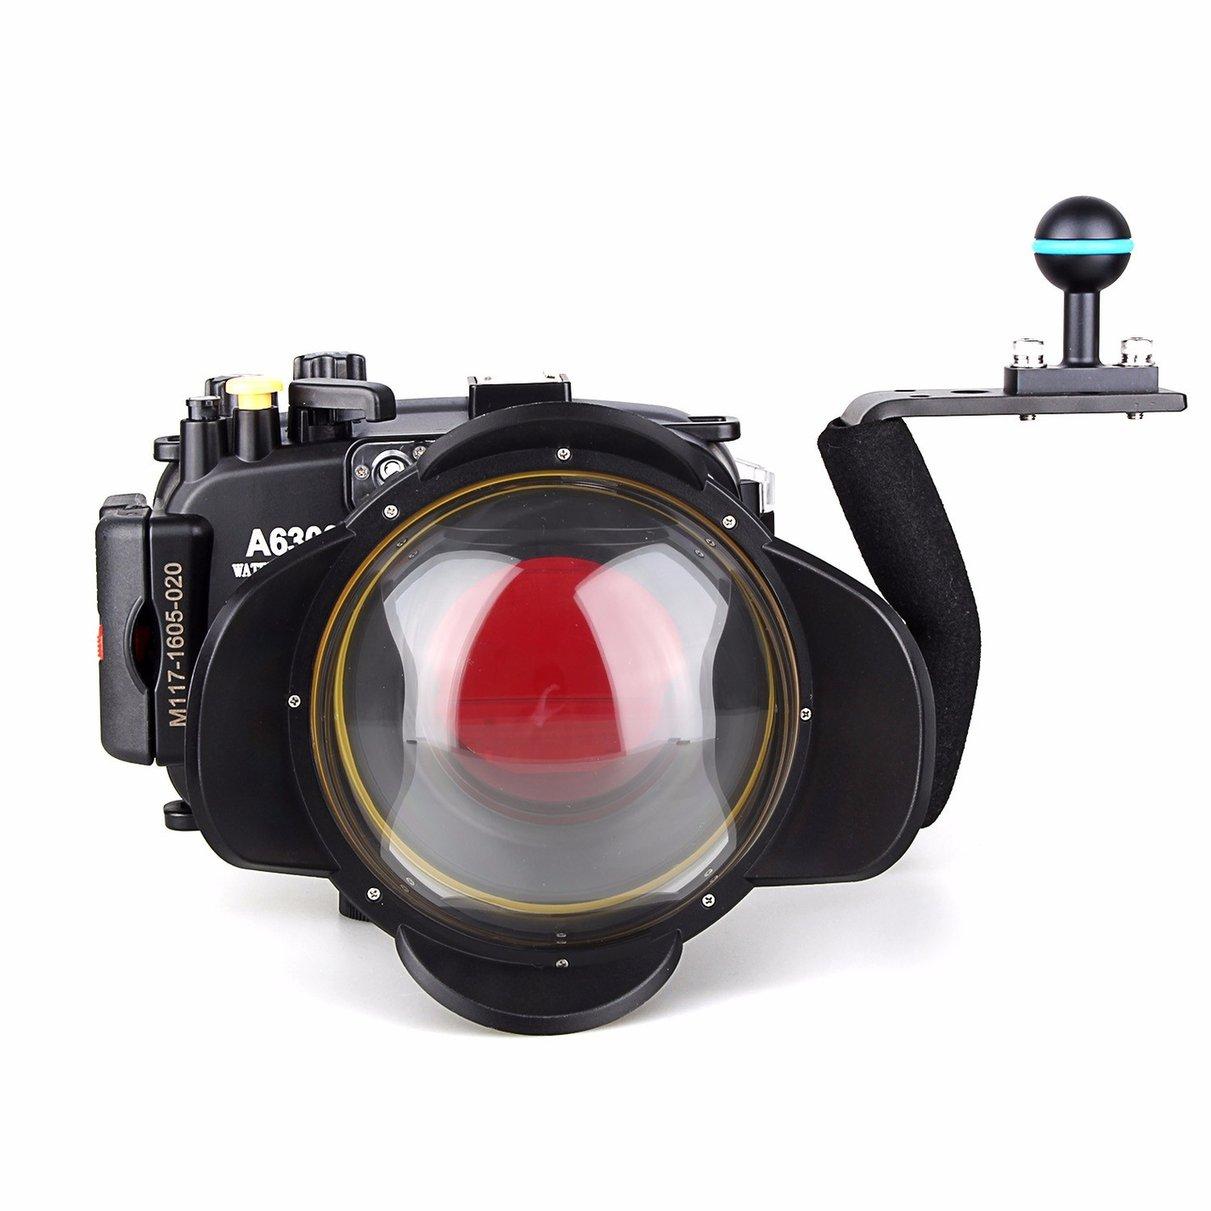 Meikon 40m/130ft Waterproof Underwater Camera Housing Case for A6300 + Aluminium handle + 67mm Fisheye Lens + 67mm Red Filter 40m 130ft waterproof housing case for sony rx100 iv m4 fisheye wide angle lens